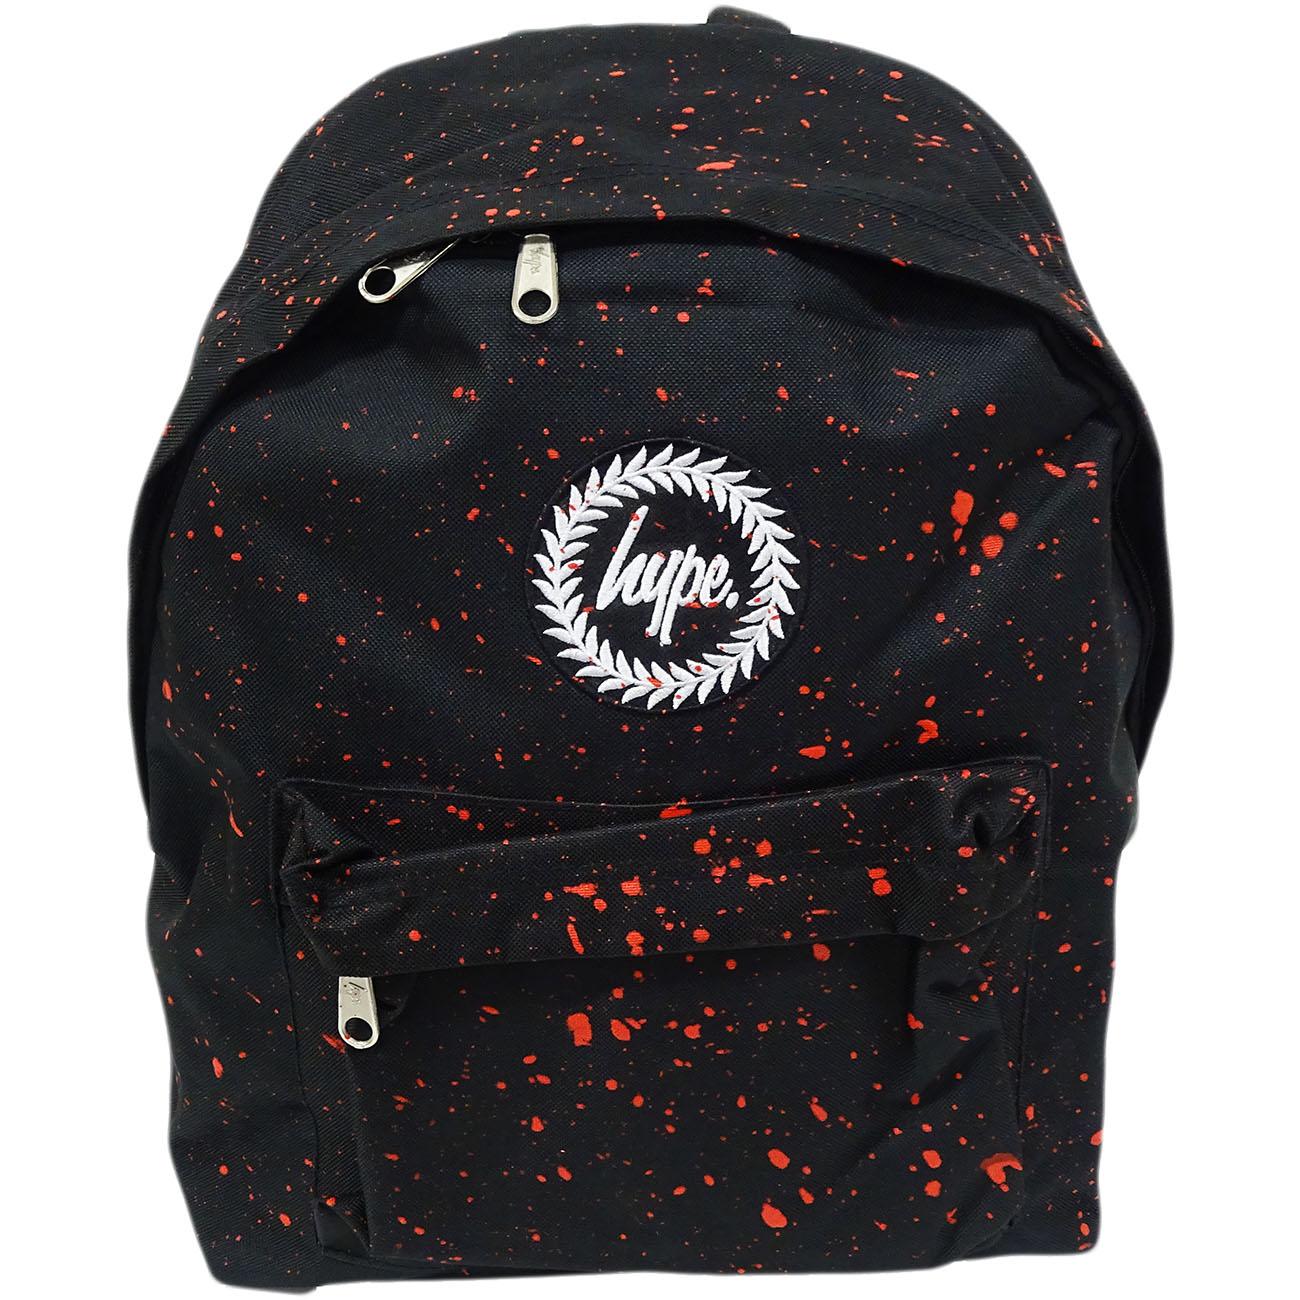 Hype Backpack Bag Black and Red Speckled